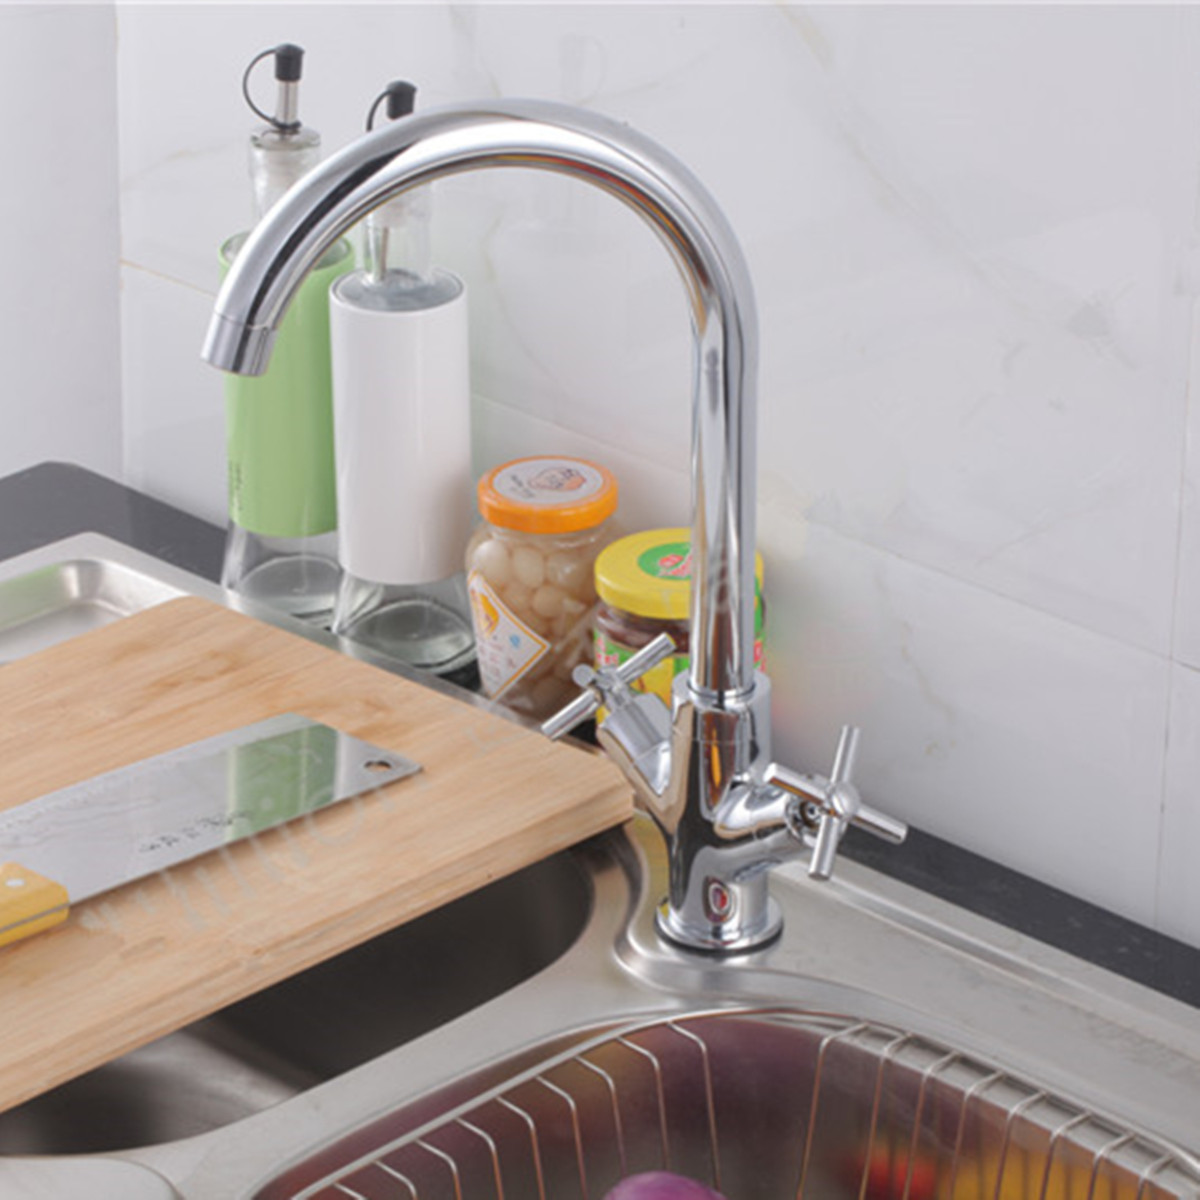 Moderne Square cascade lavabo robinet mitigeur chrome bain vestiaire CUISINE